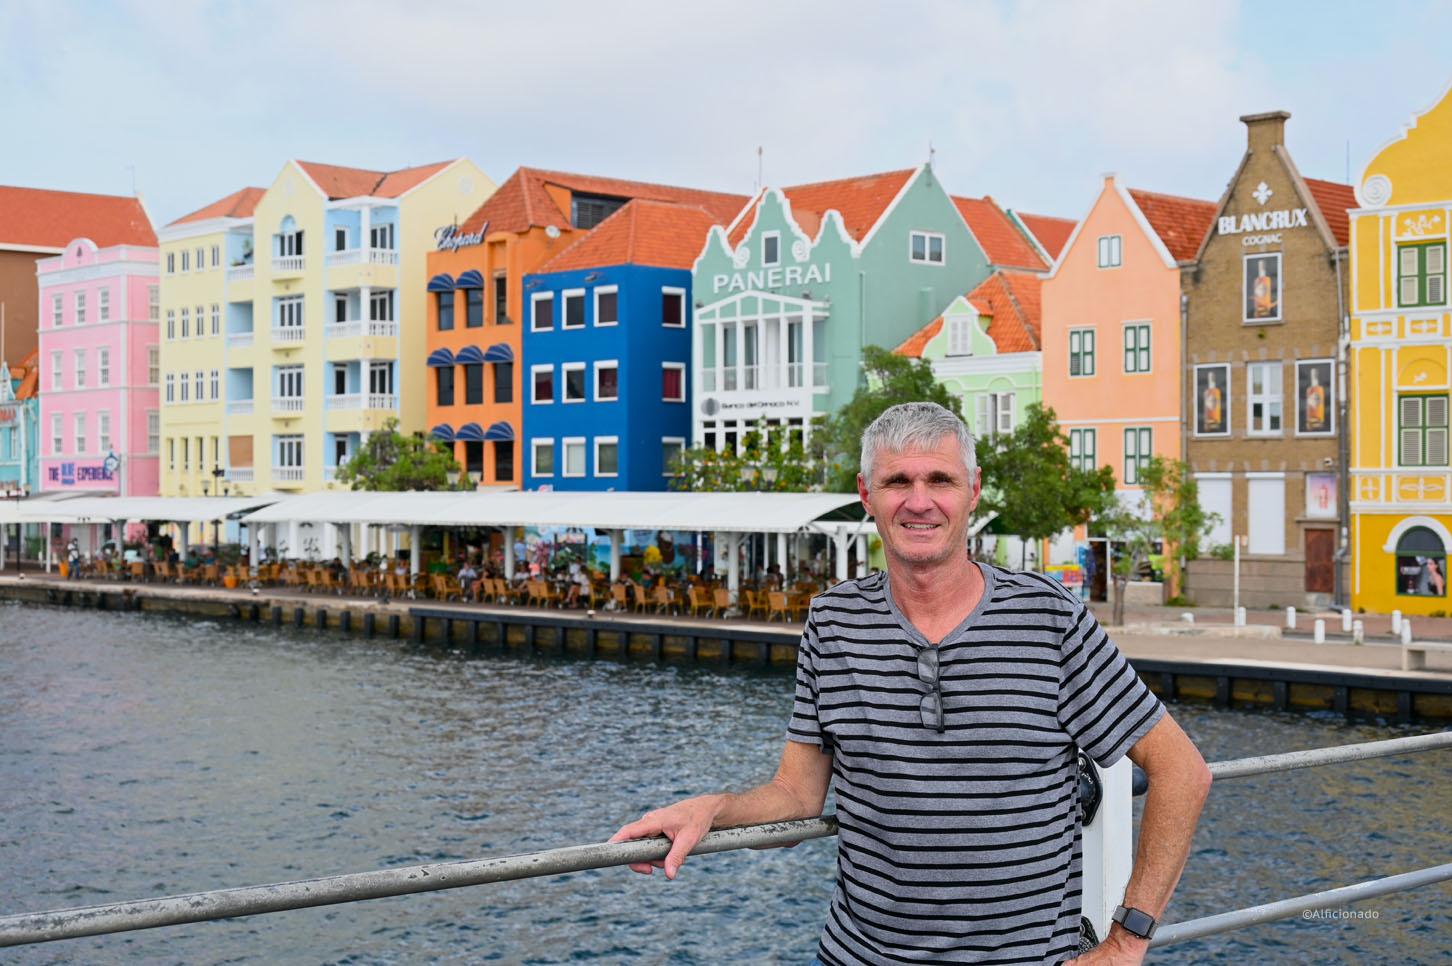 Transamerica 2021   Willemstad   Curacao   Dutch Caribbean island